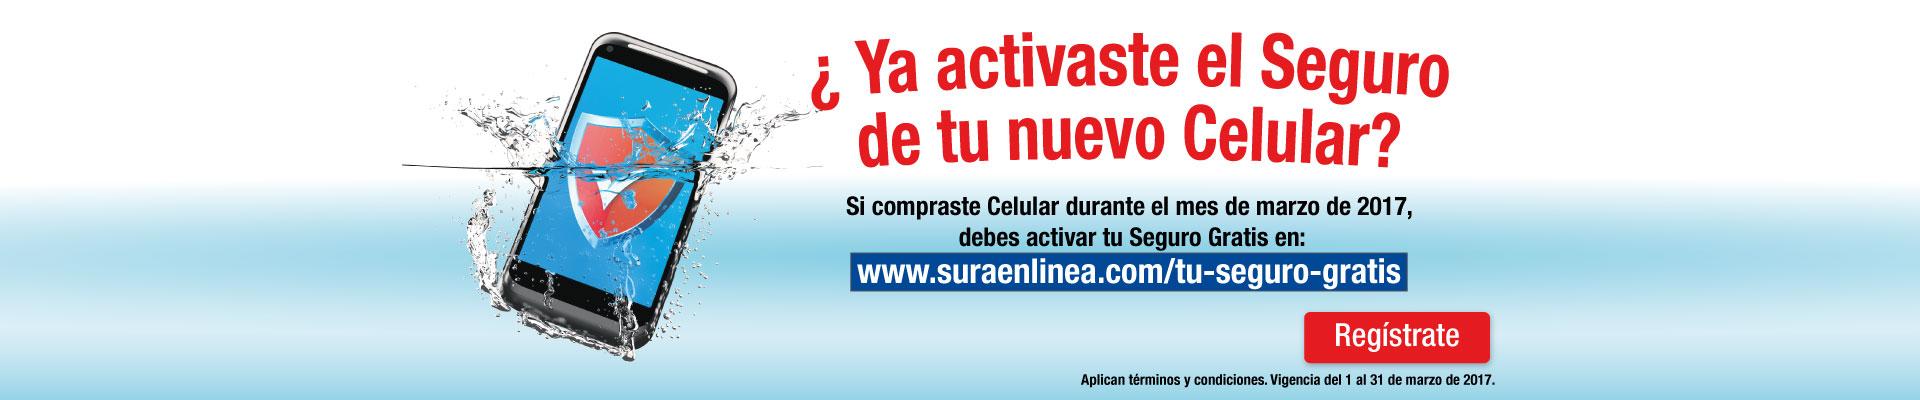 Bppal KT - Activa Seguro Gratis Celulares - Mar29